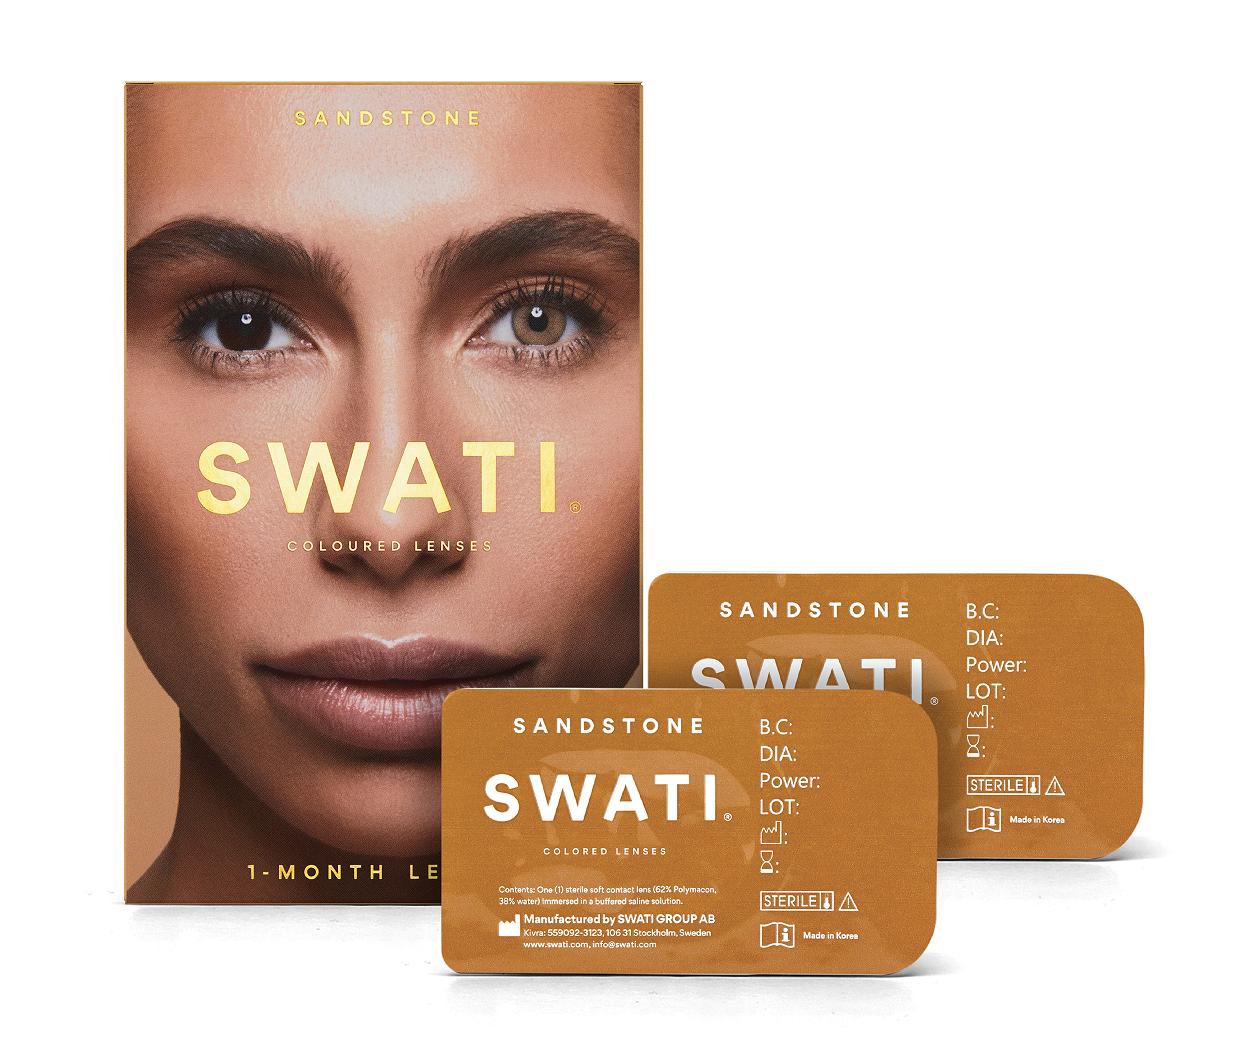 SWATI - Coloured Contact Lenses 1 Month - Sandstone